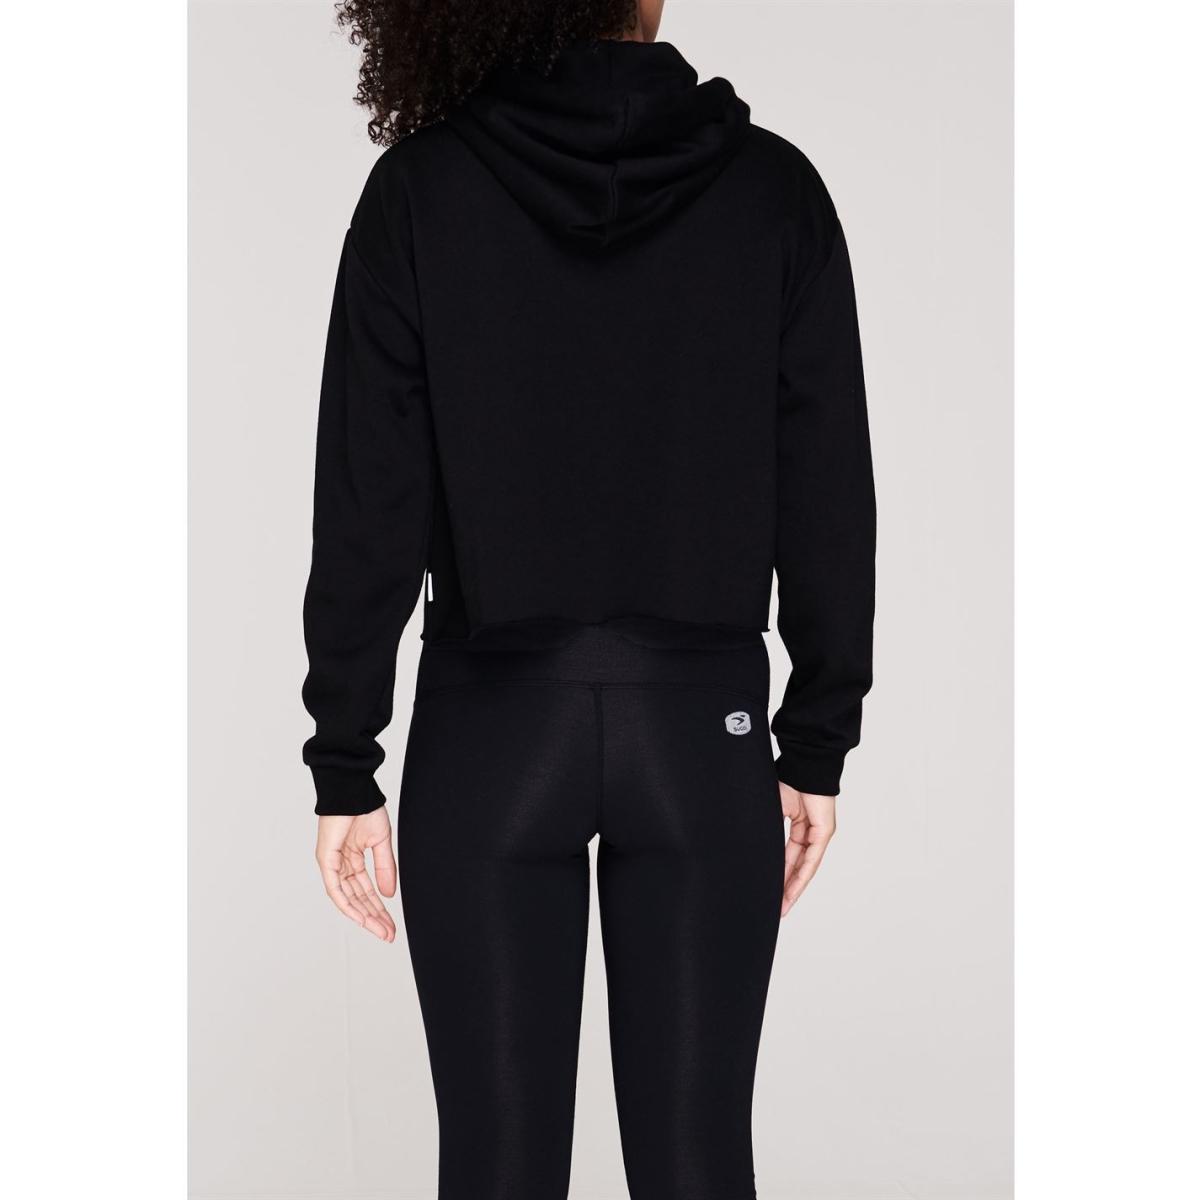 Lee Cooper Kapuzenpullover Sweatshirt Pullover Damen Kapuzenjacke Jacke 8290